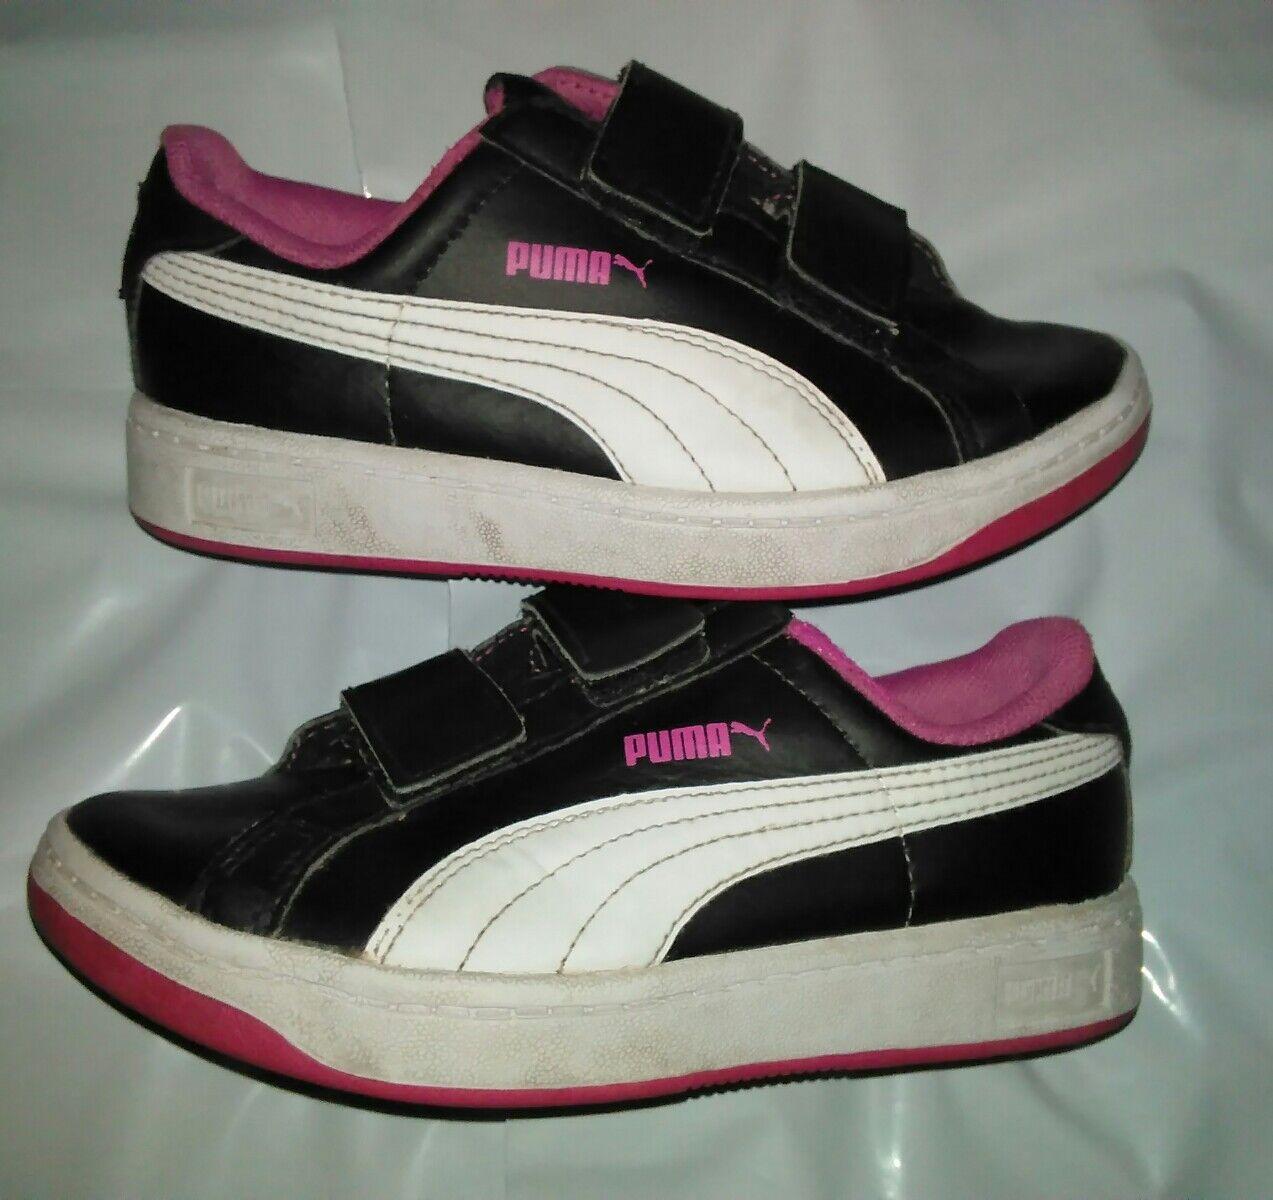 Puma girls sz 12, old school, black